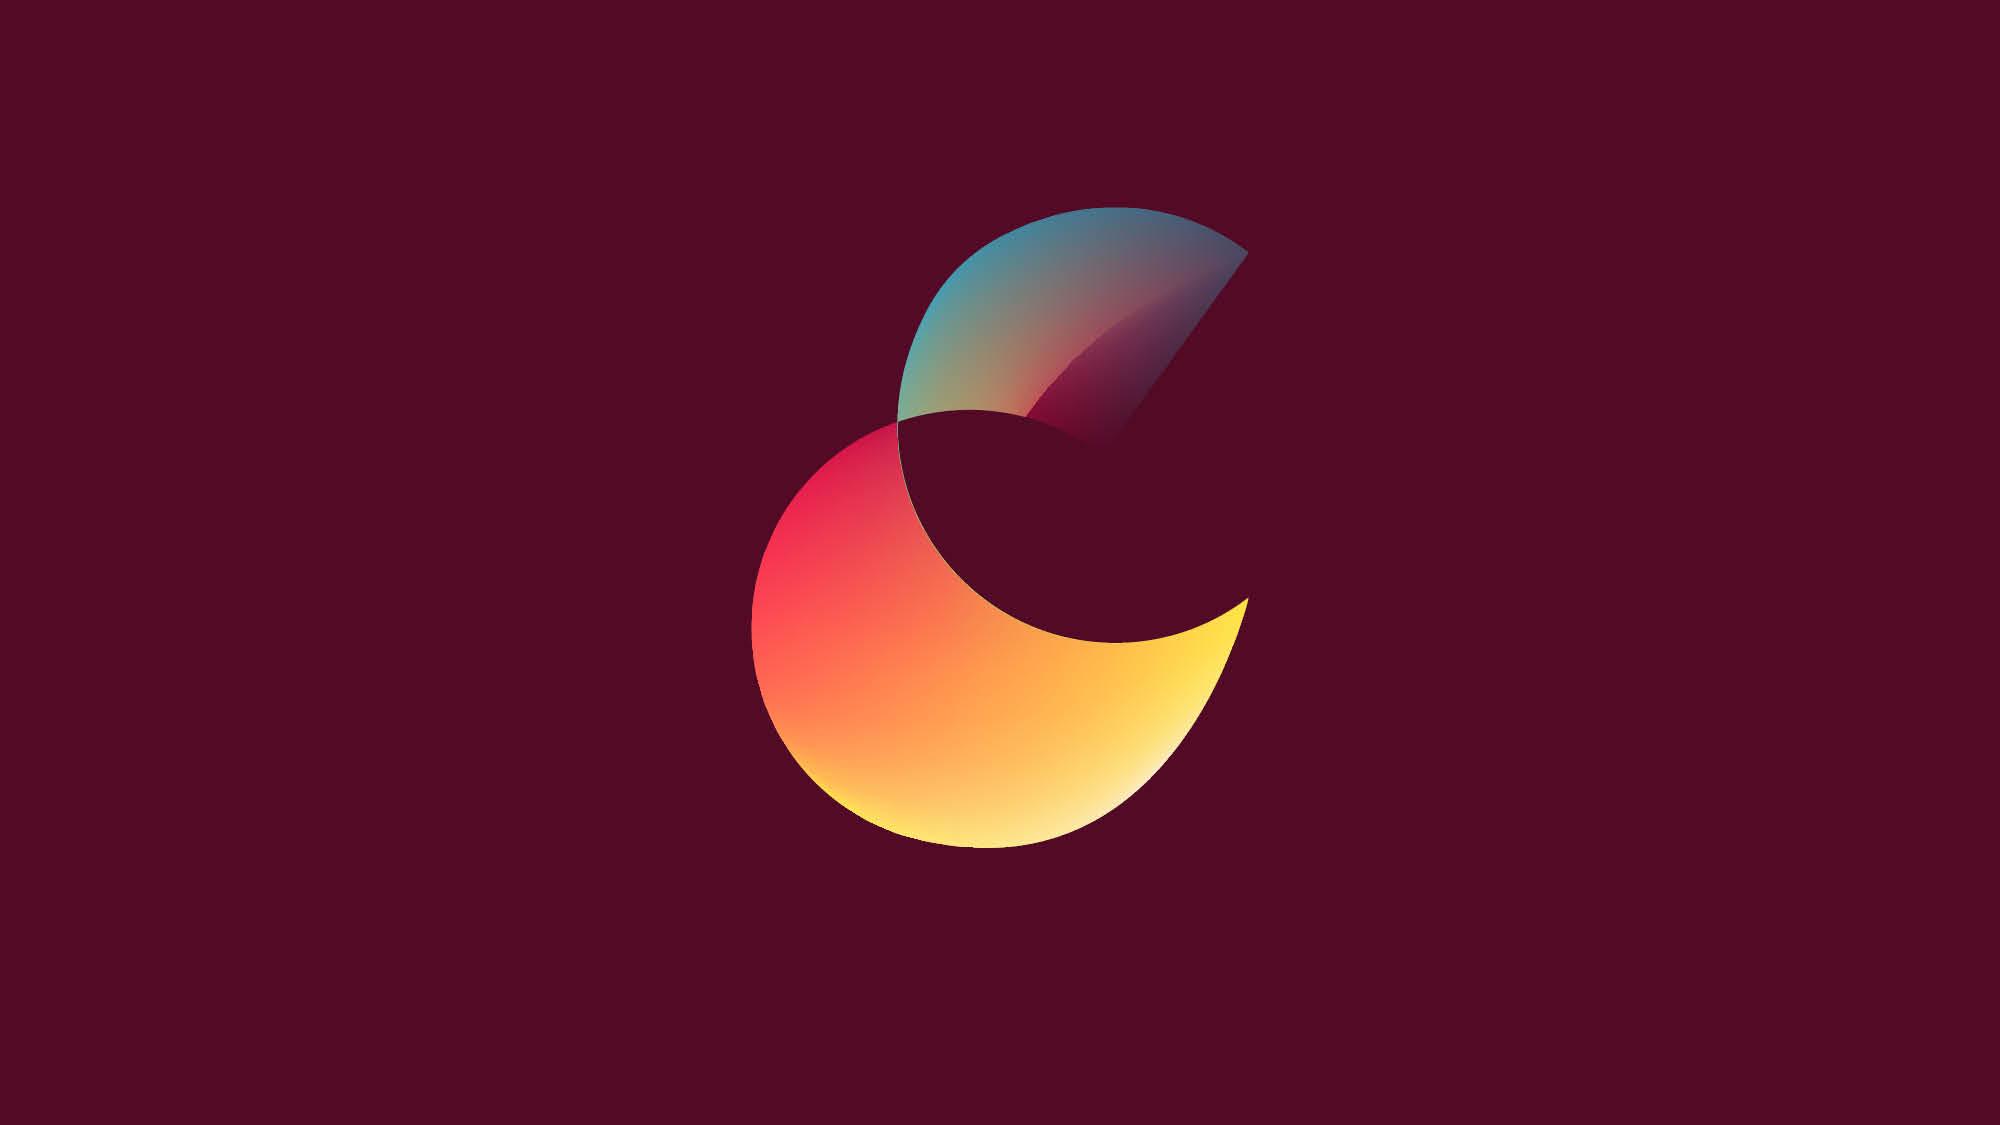 Lanatta-Branding-and-Design-Culture-Code